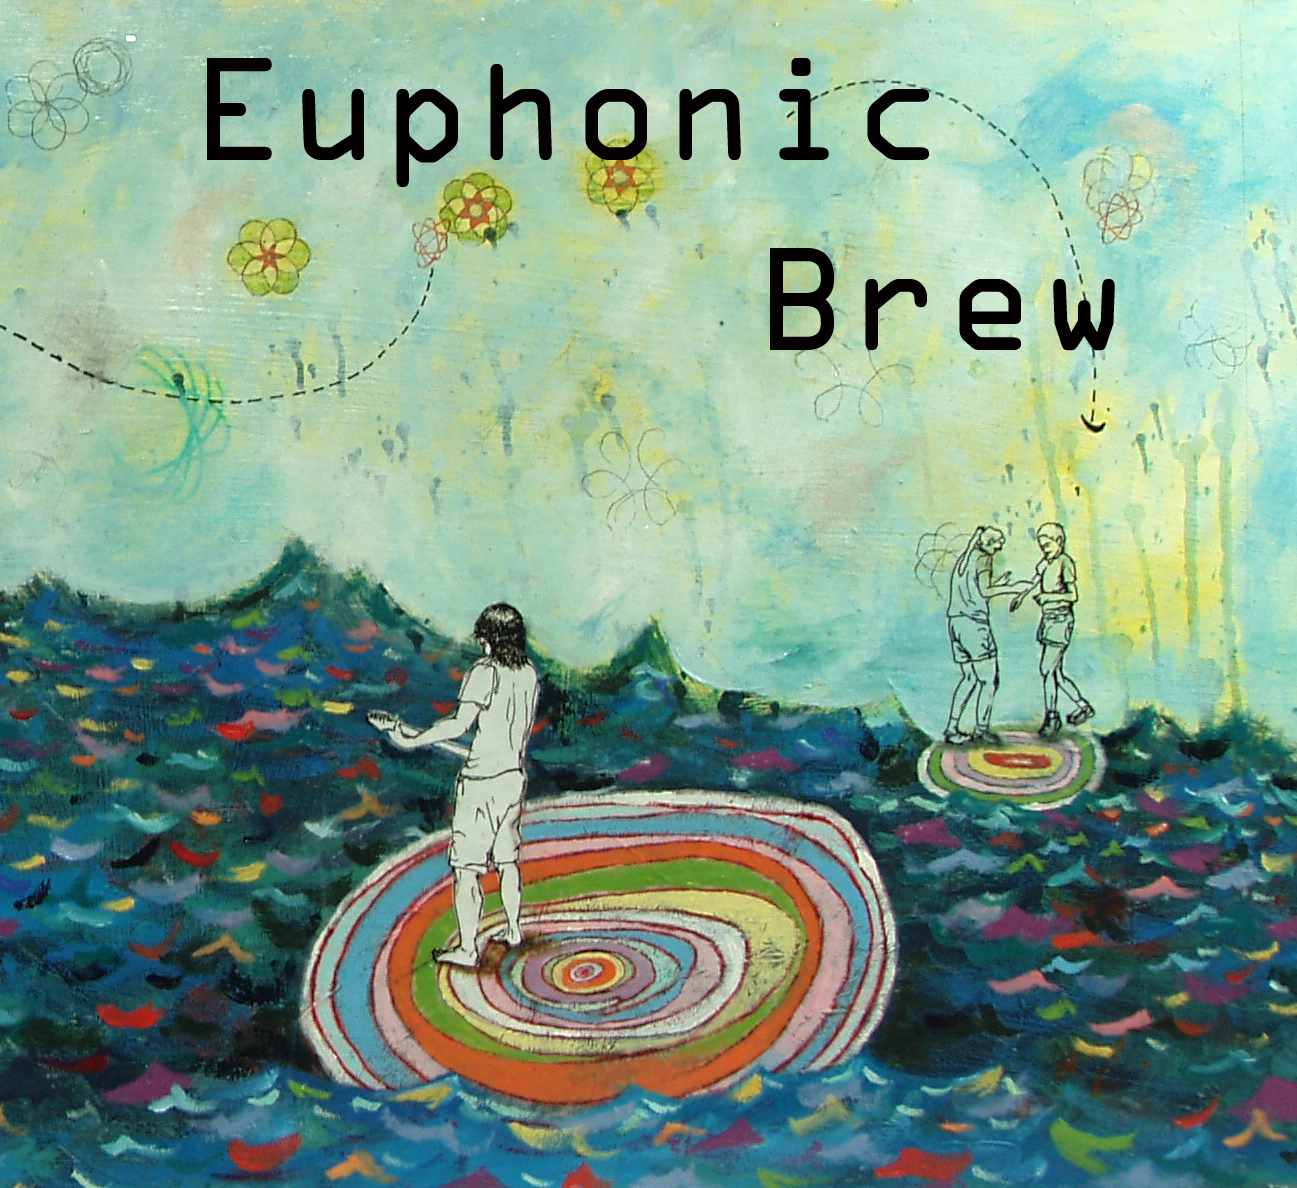 Euphonic Brew Album Art, front